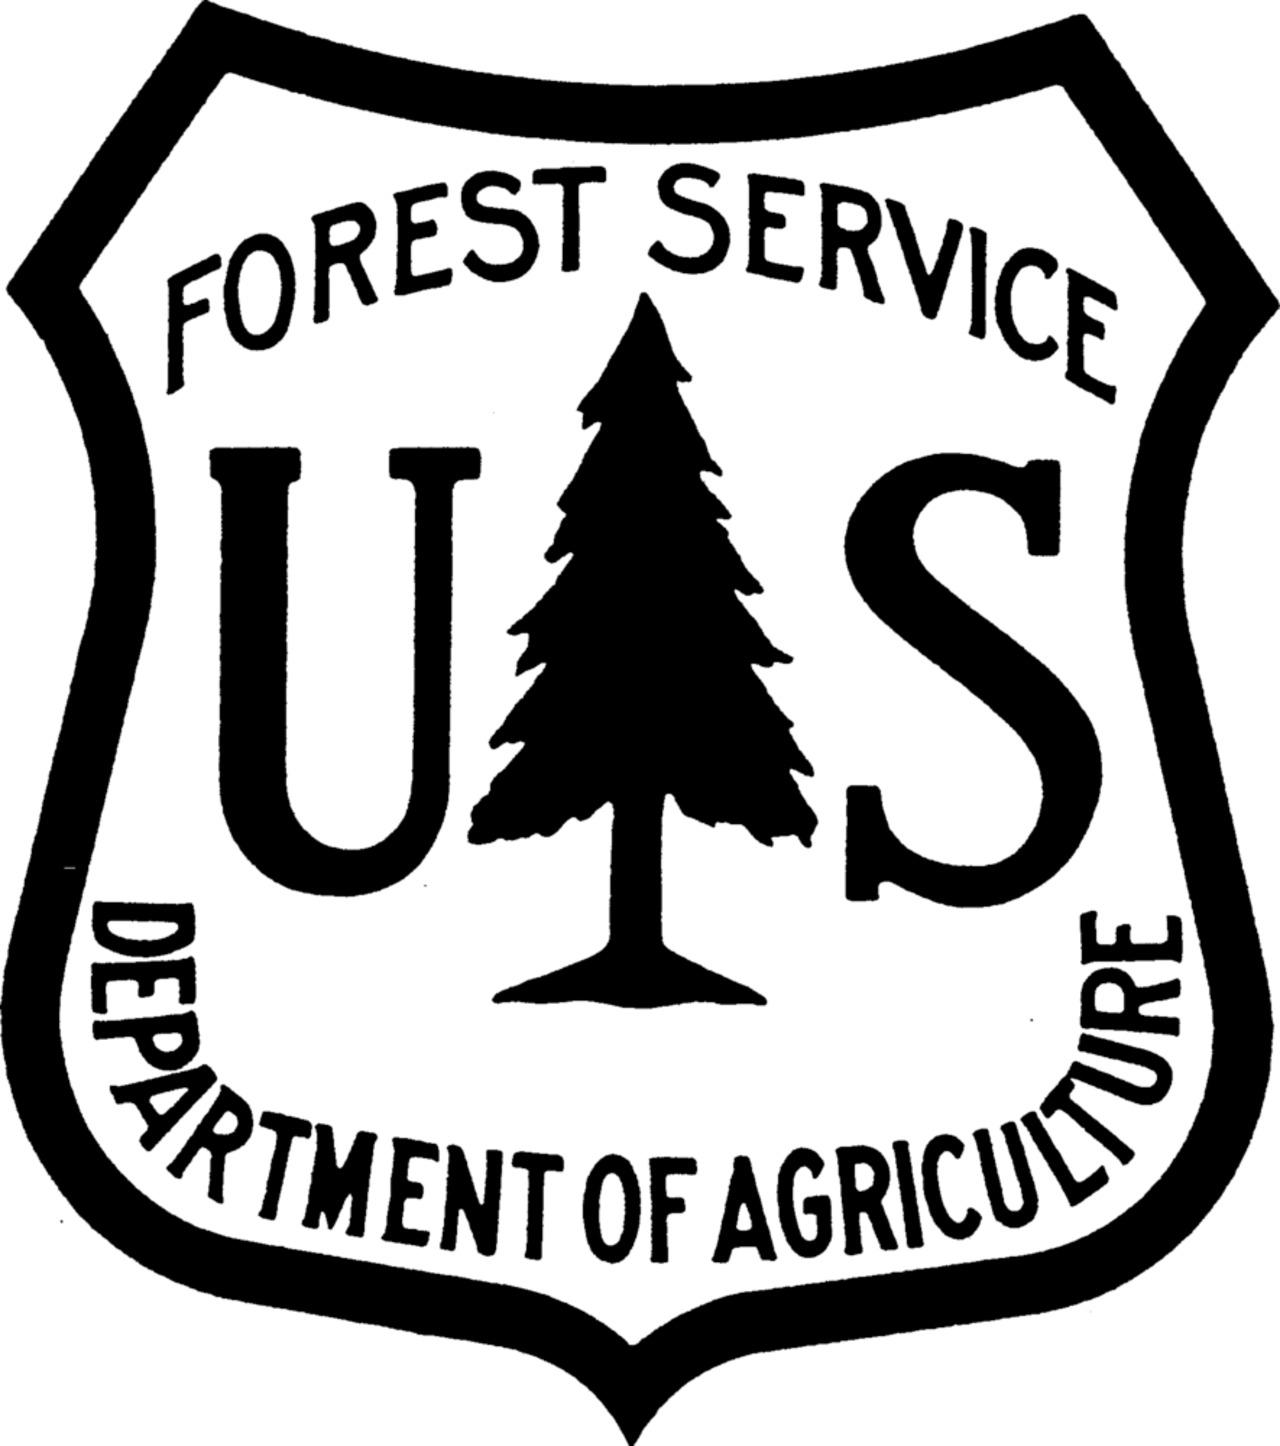 us-forest-service-logo_10917763.jpg